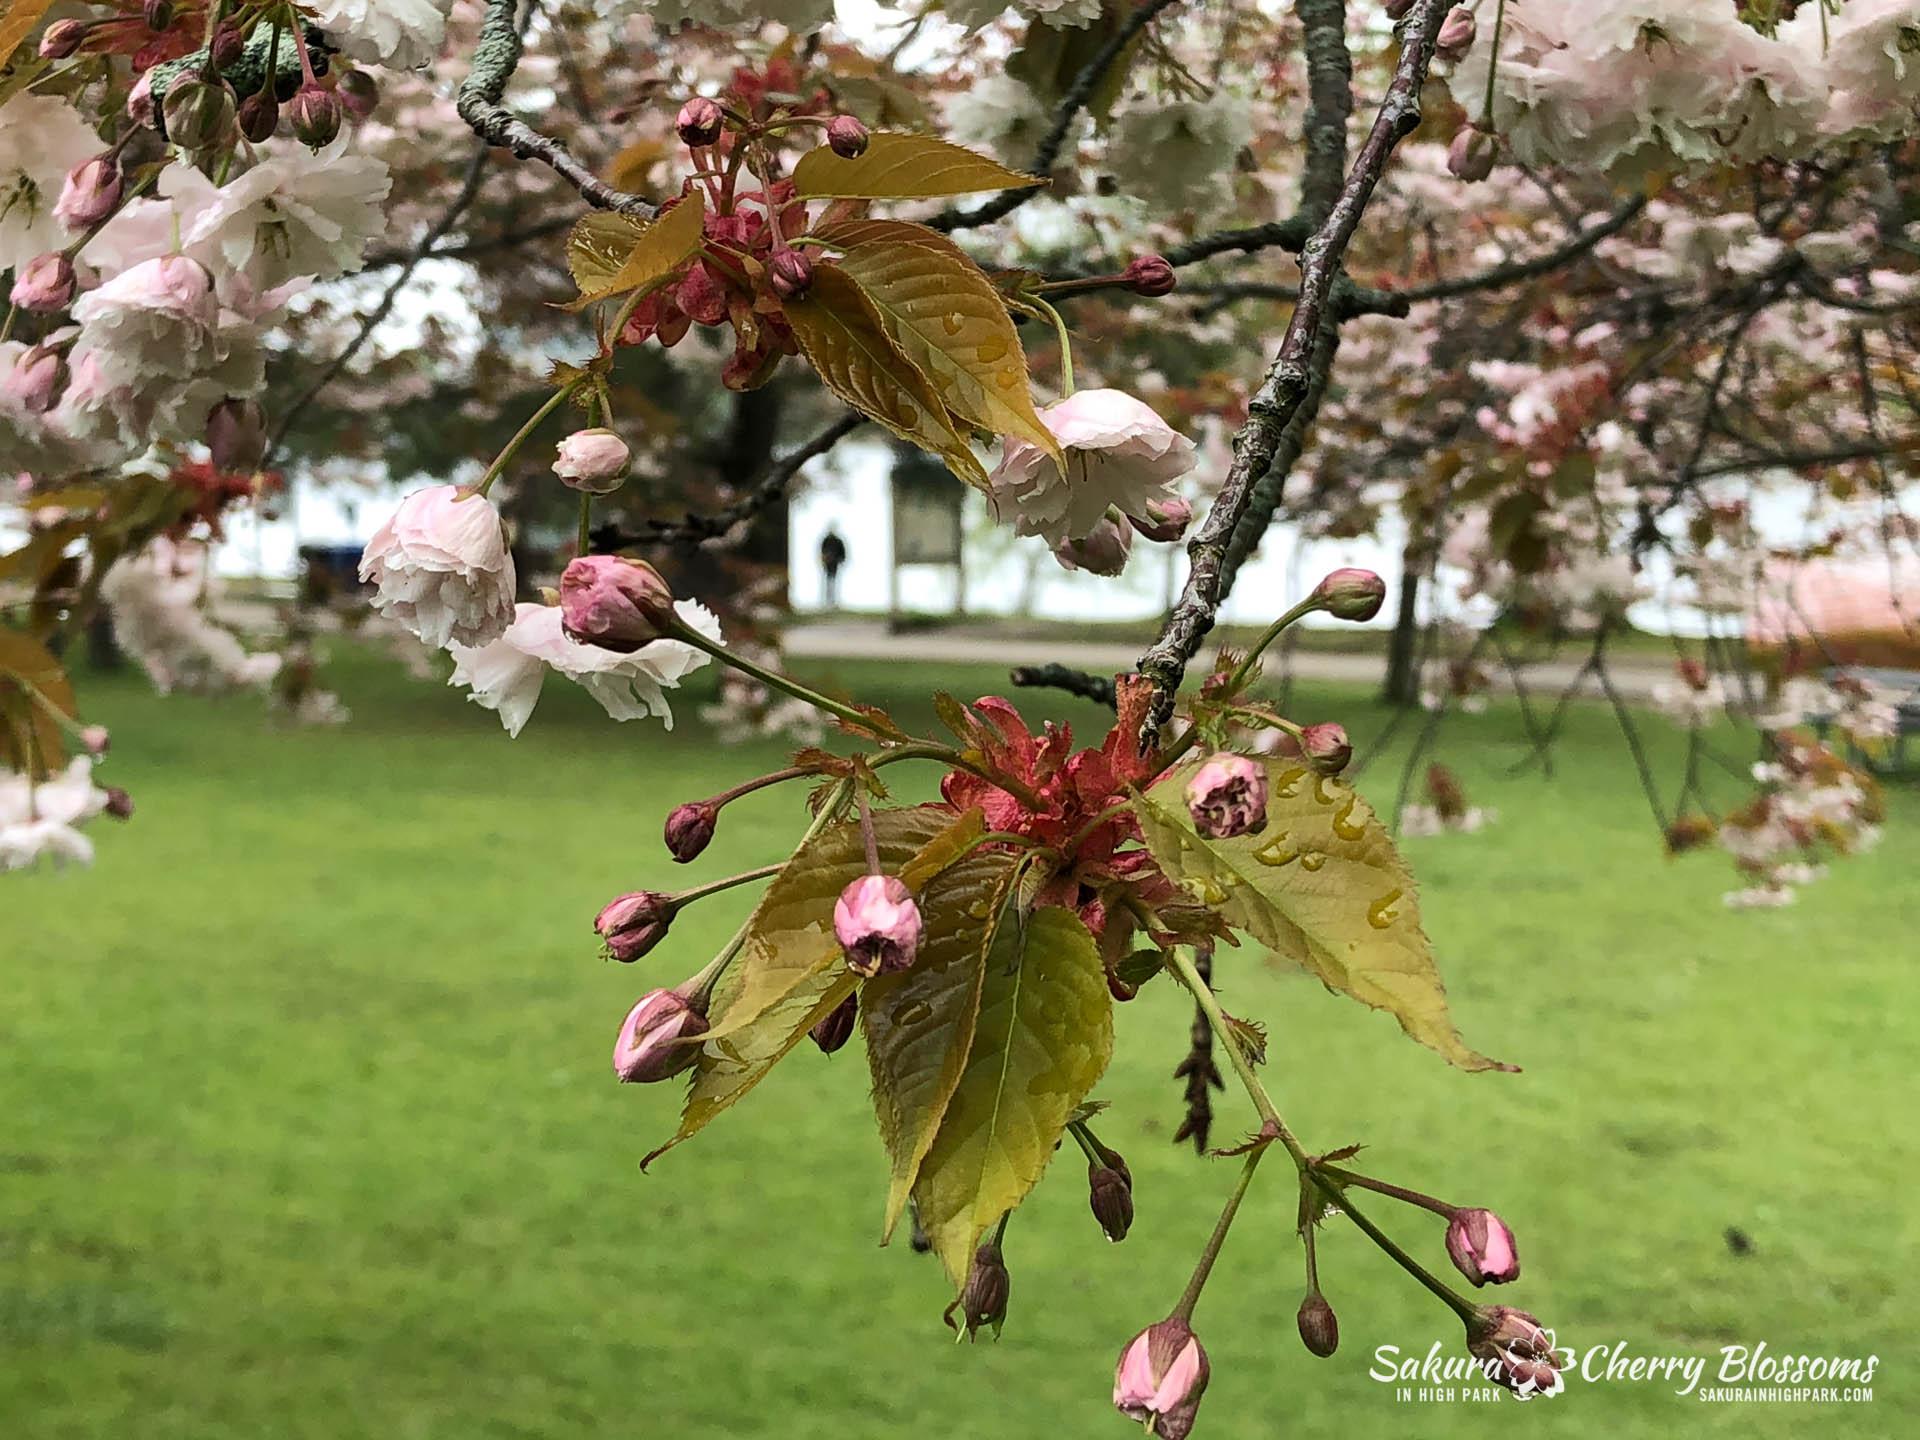 Sakura-Watch-May-22-2018-1.jpg